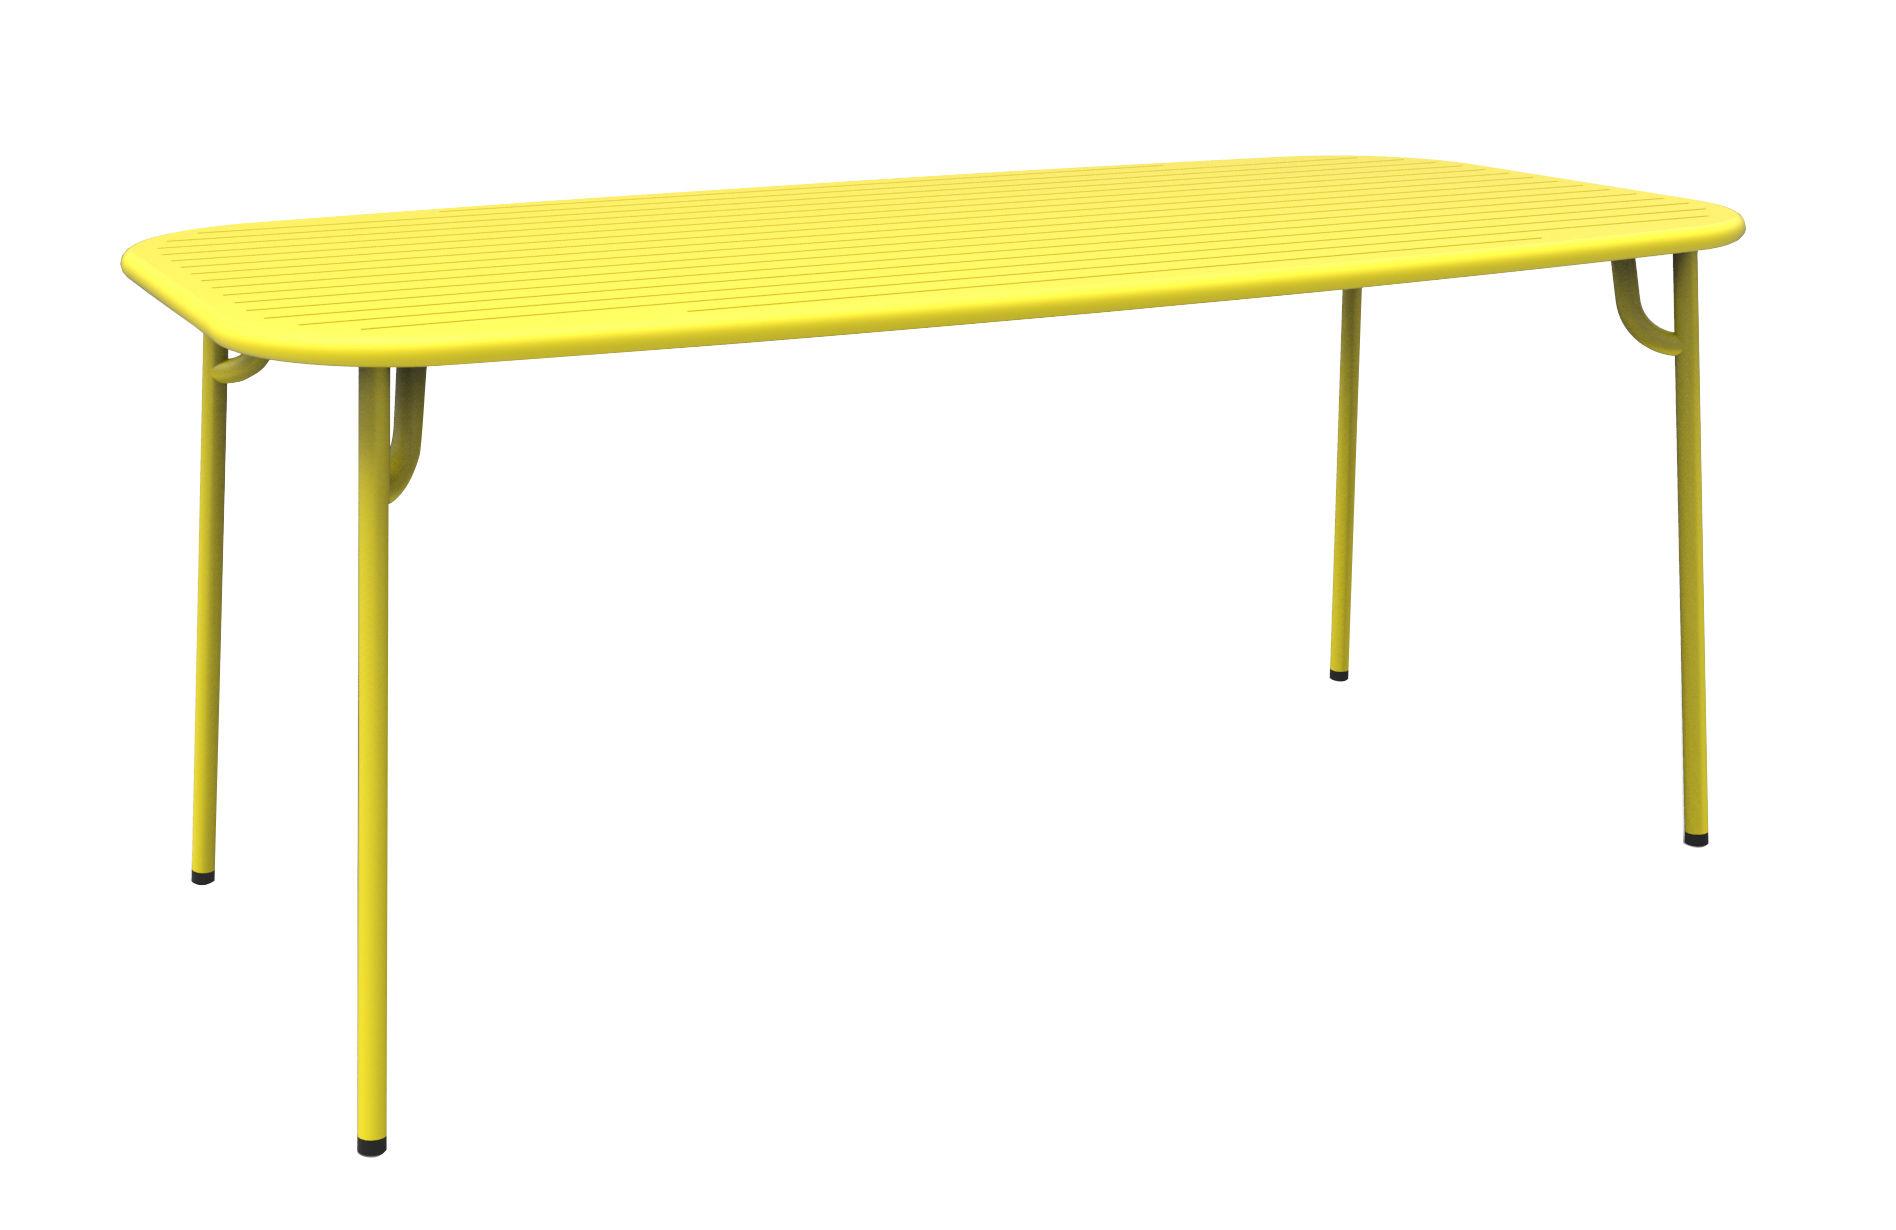 week end rectangular table 180 x 85 cm aluminium